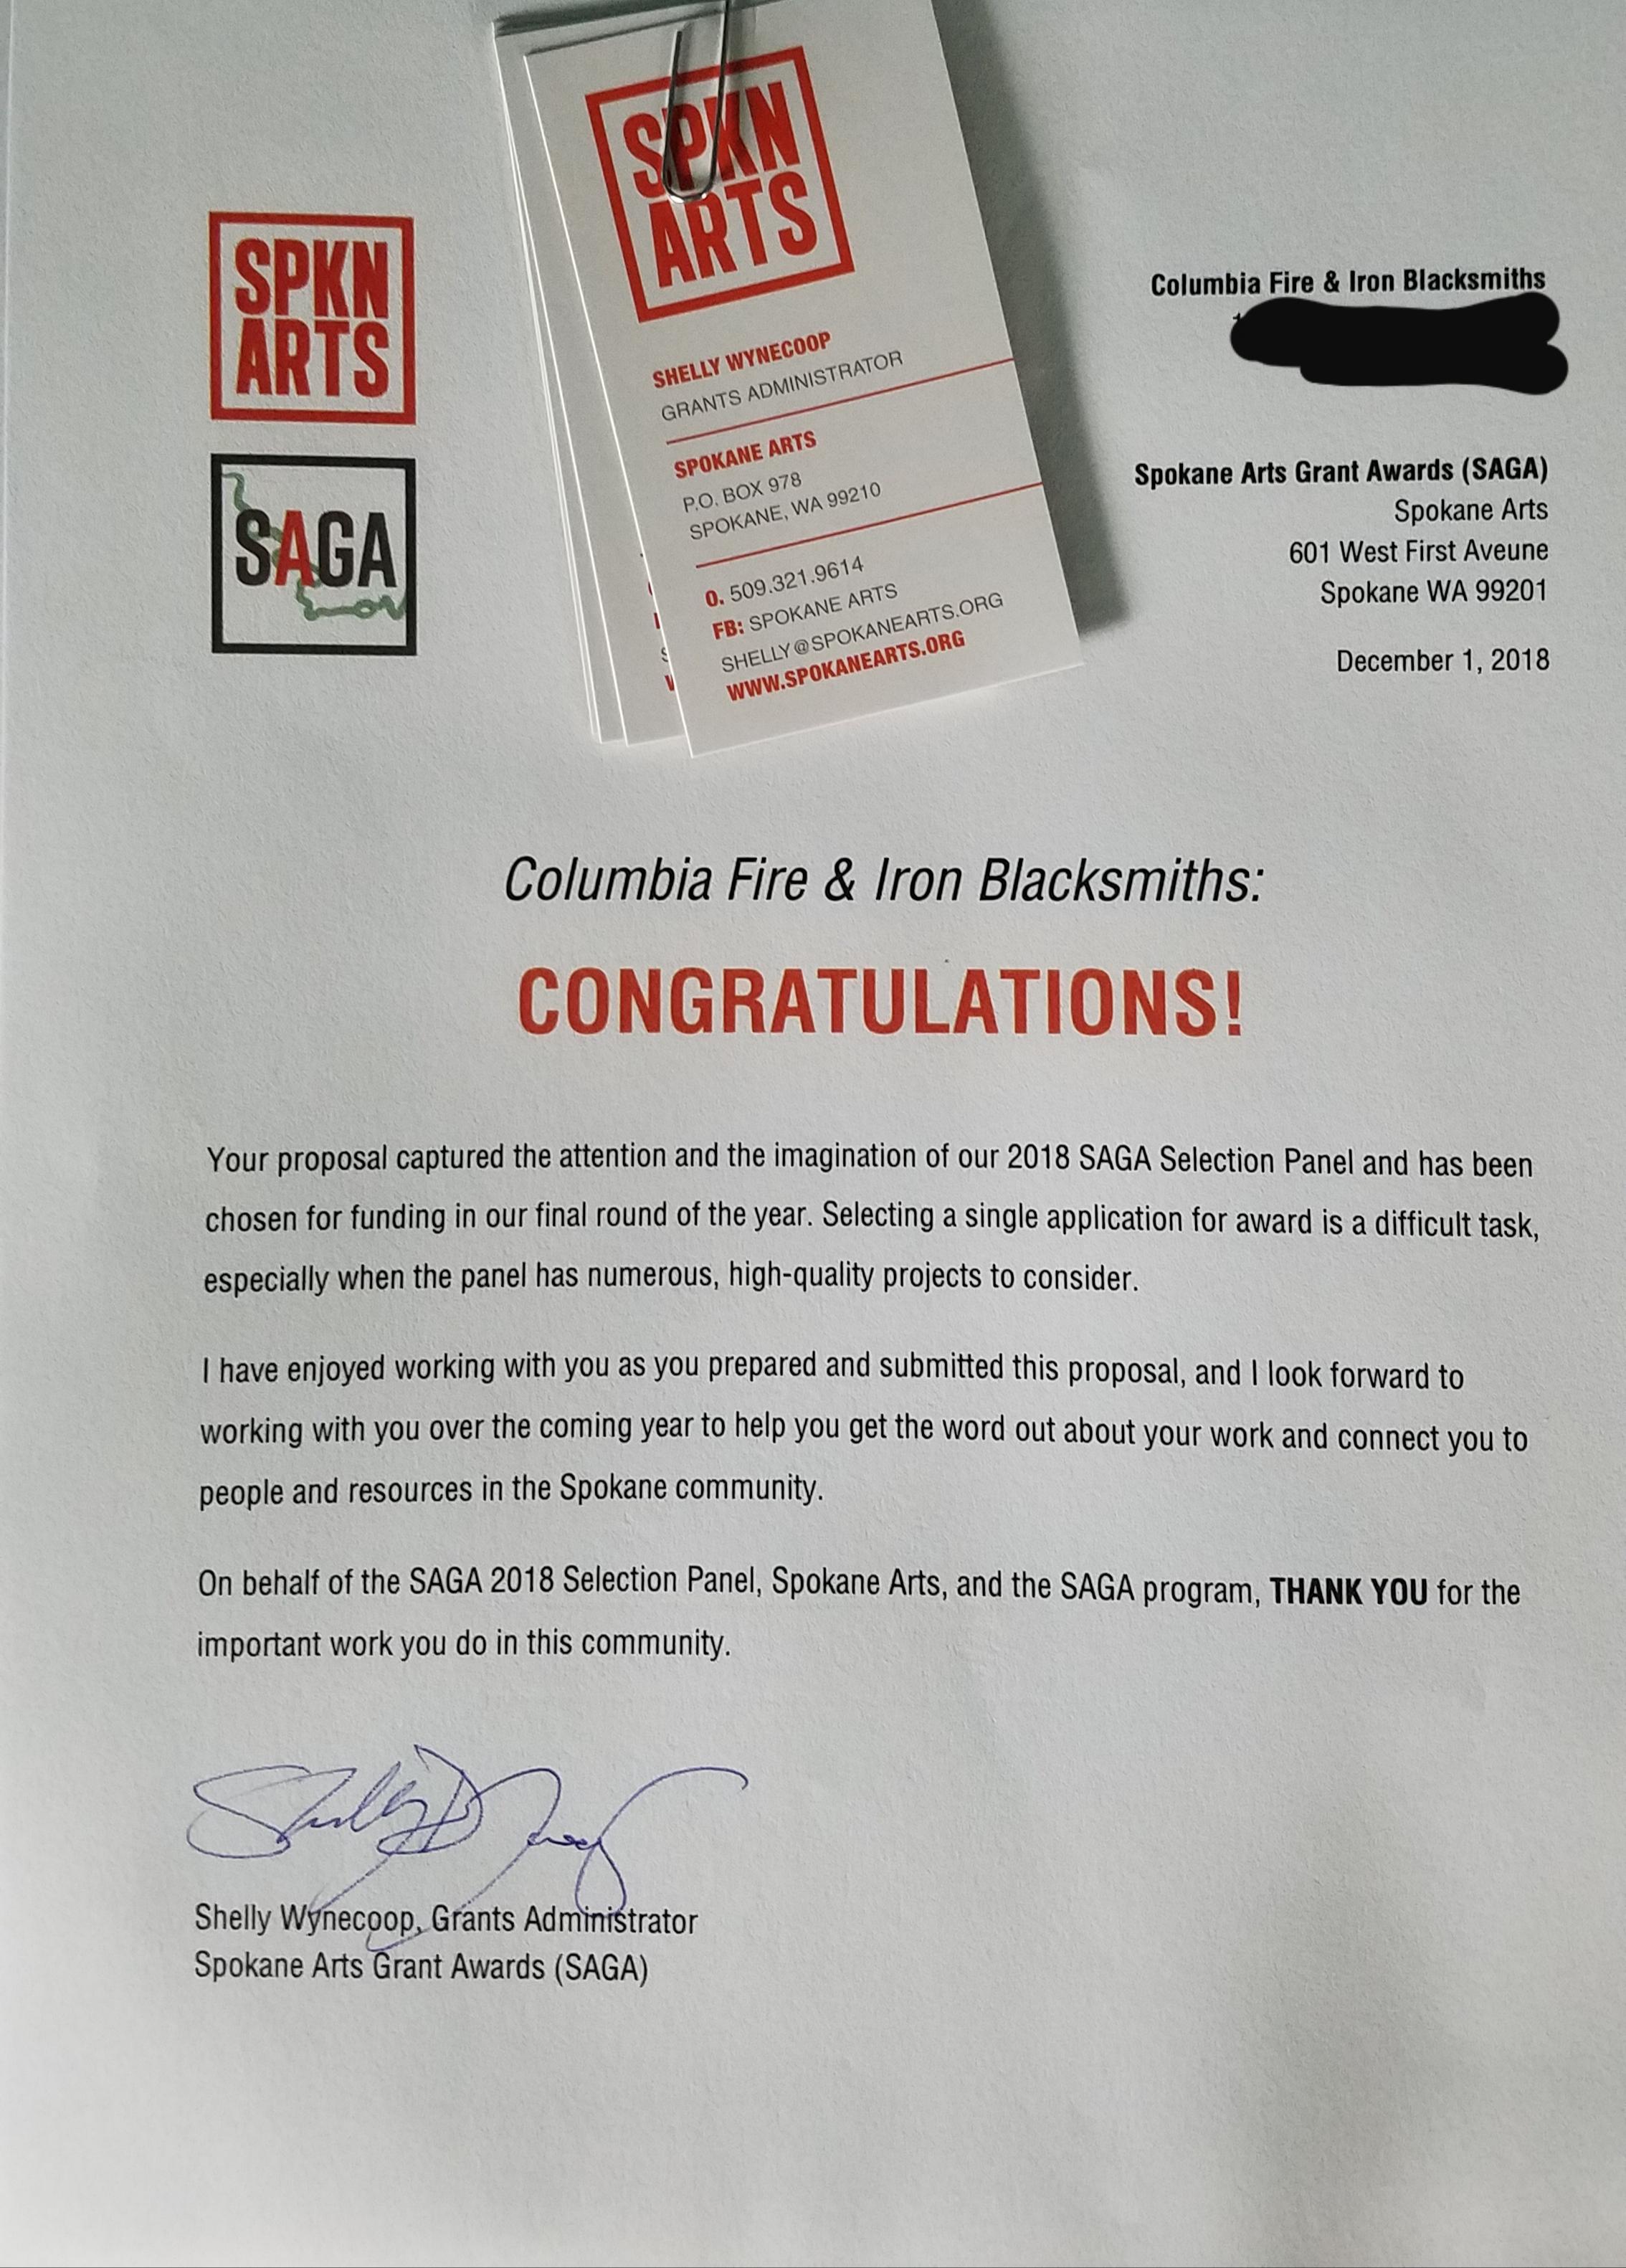 Letter from SAGA